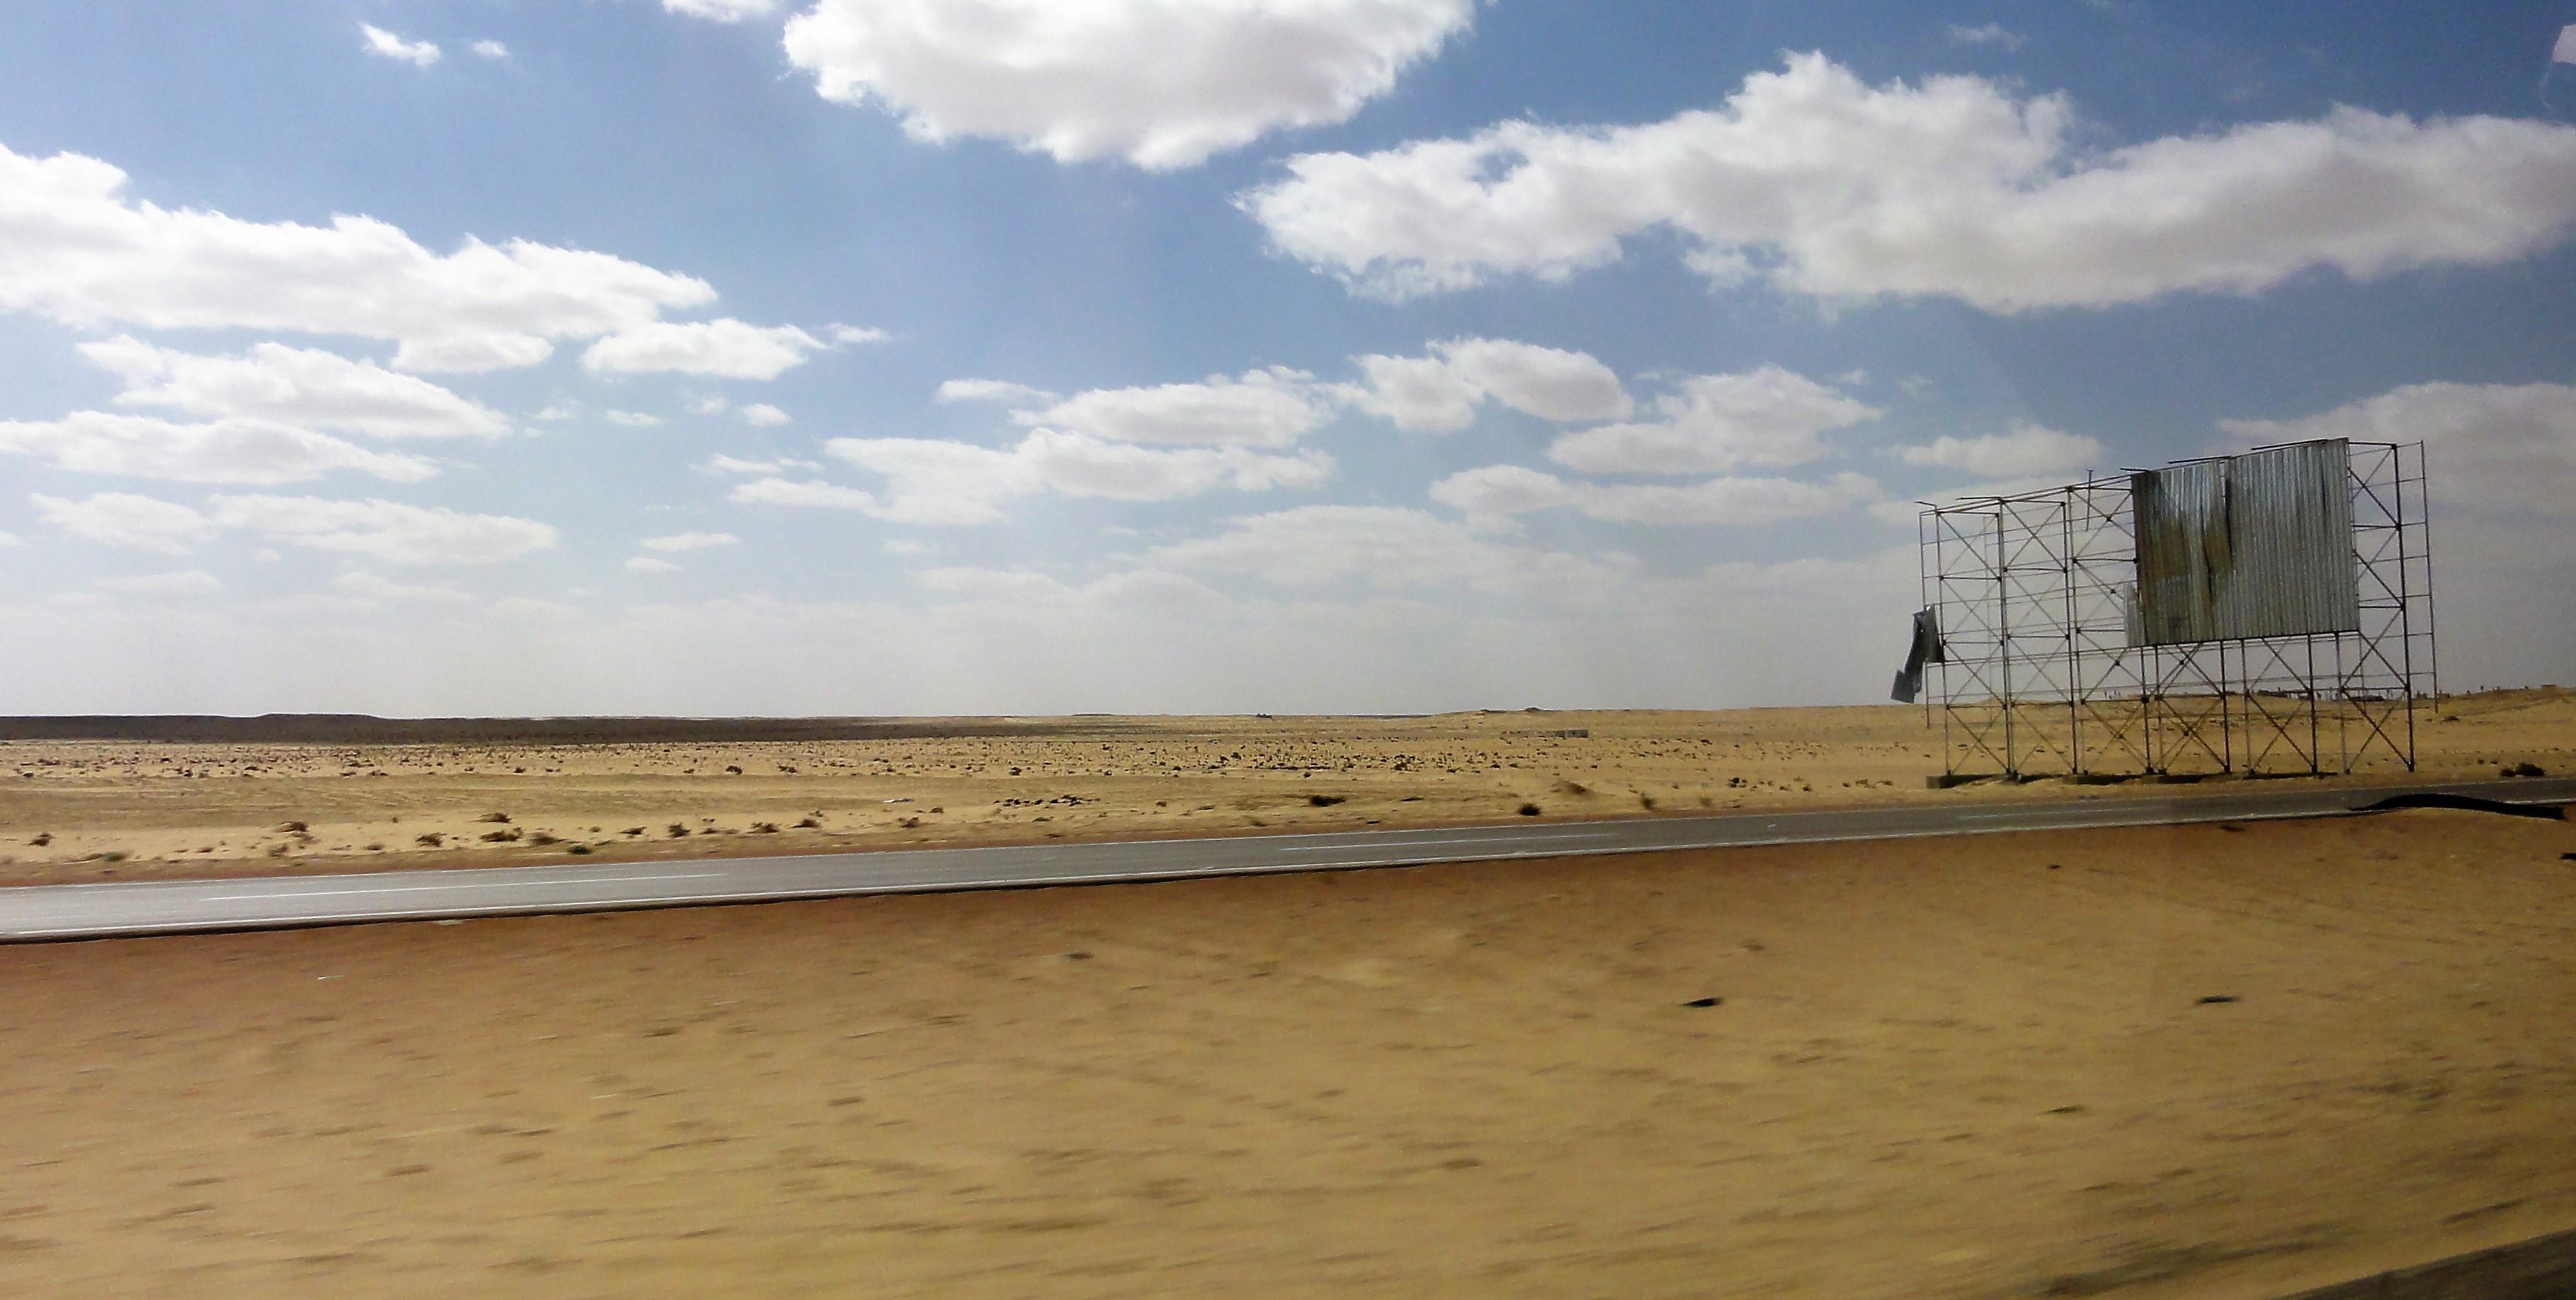 Al Alamein Road, Egypt